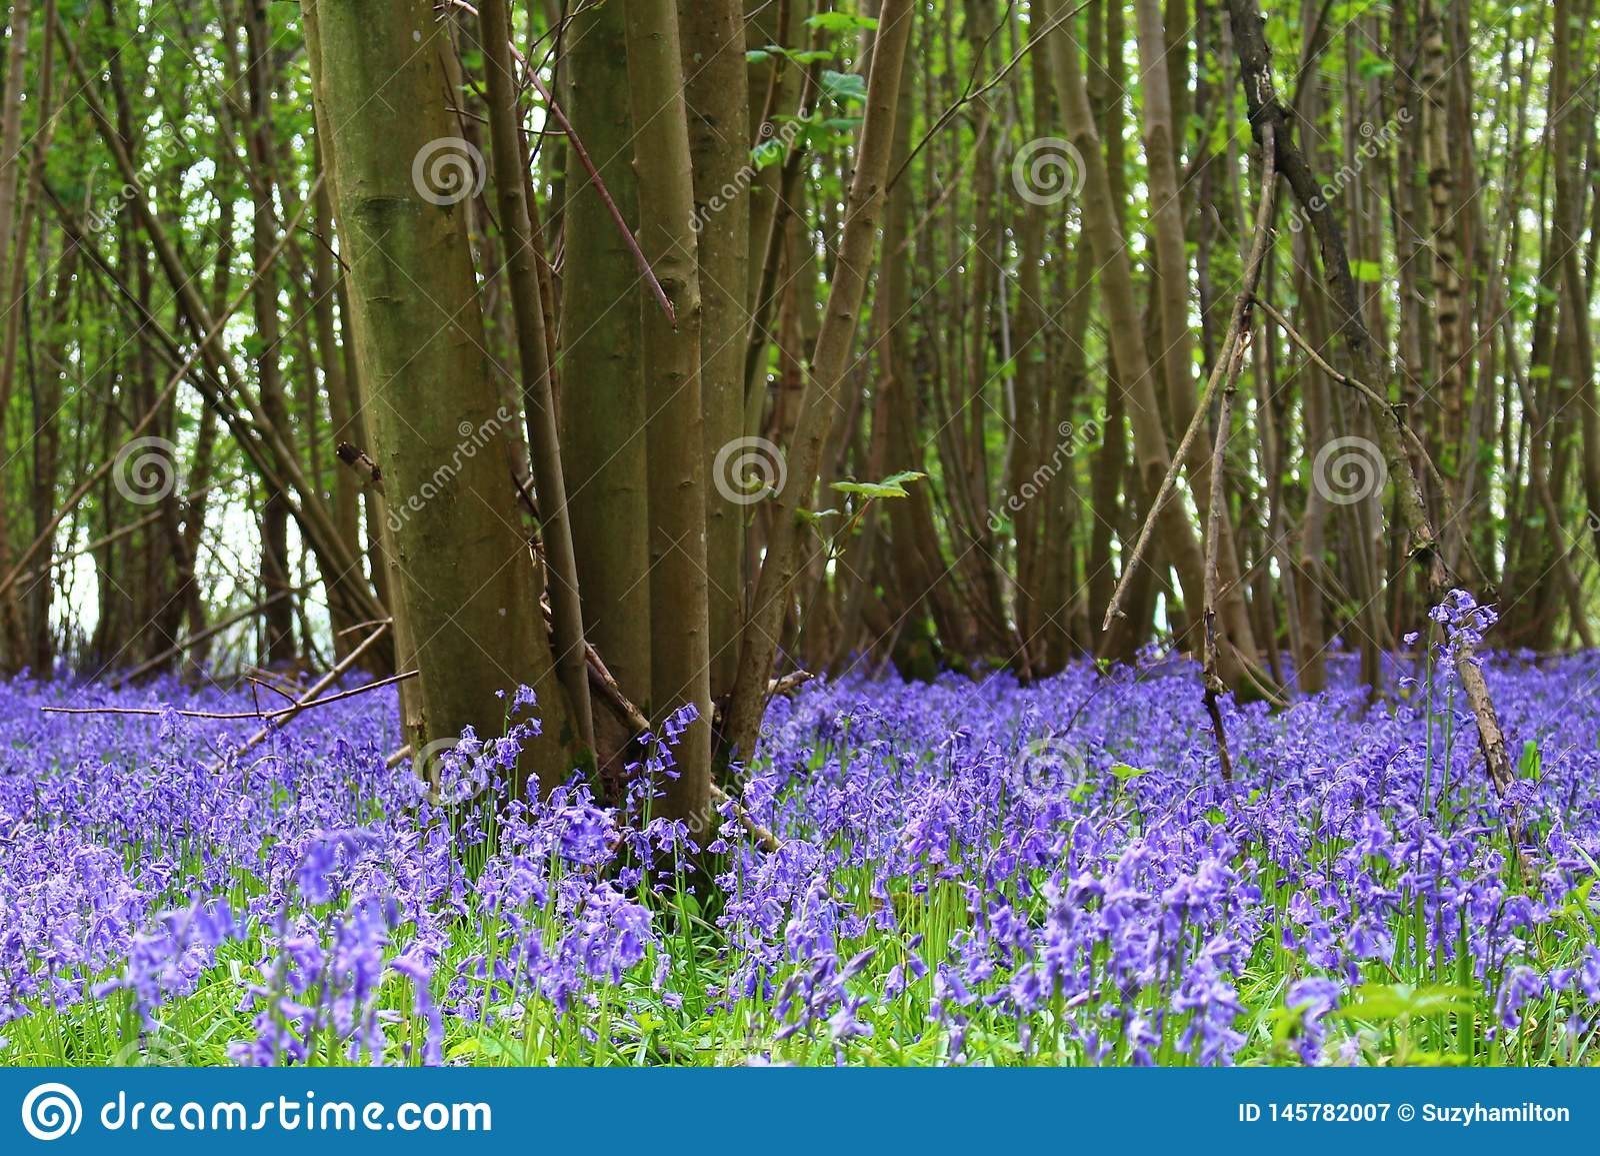 Bluebell wood Hyacinthoides non-scripta woodland floor landscape